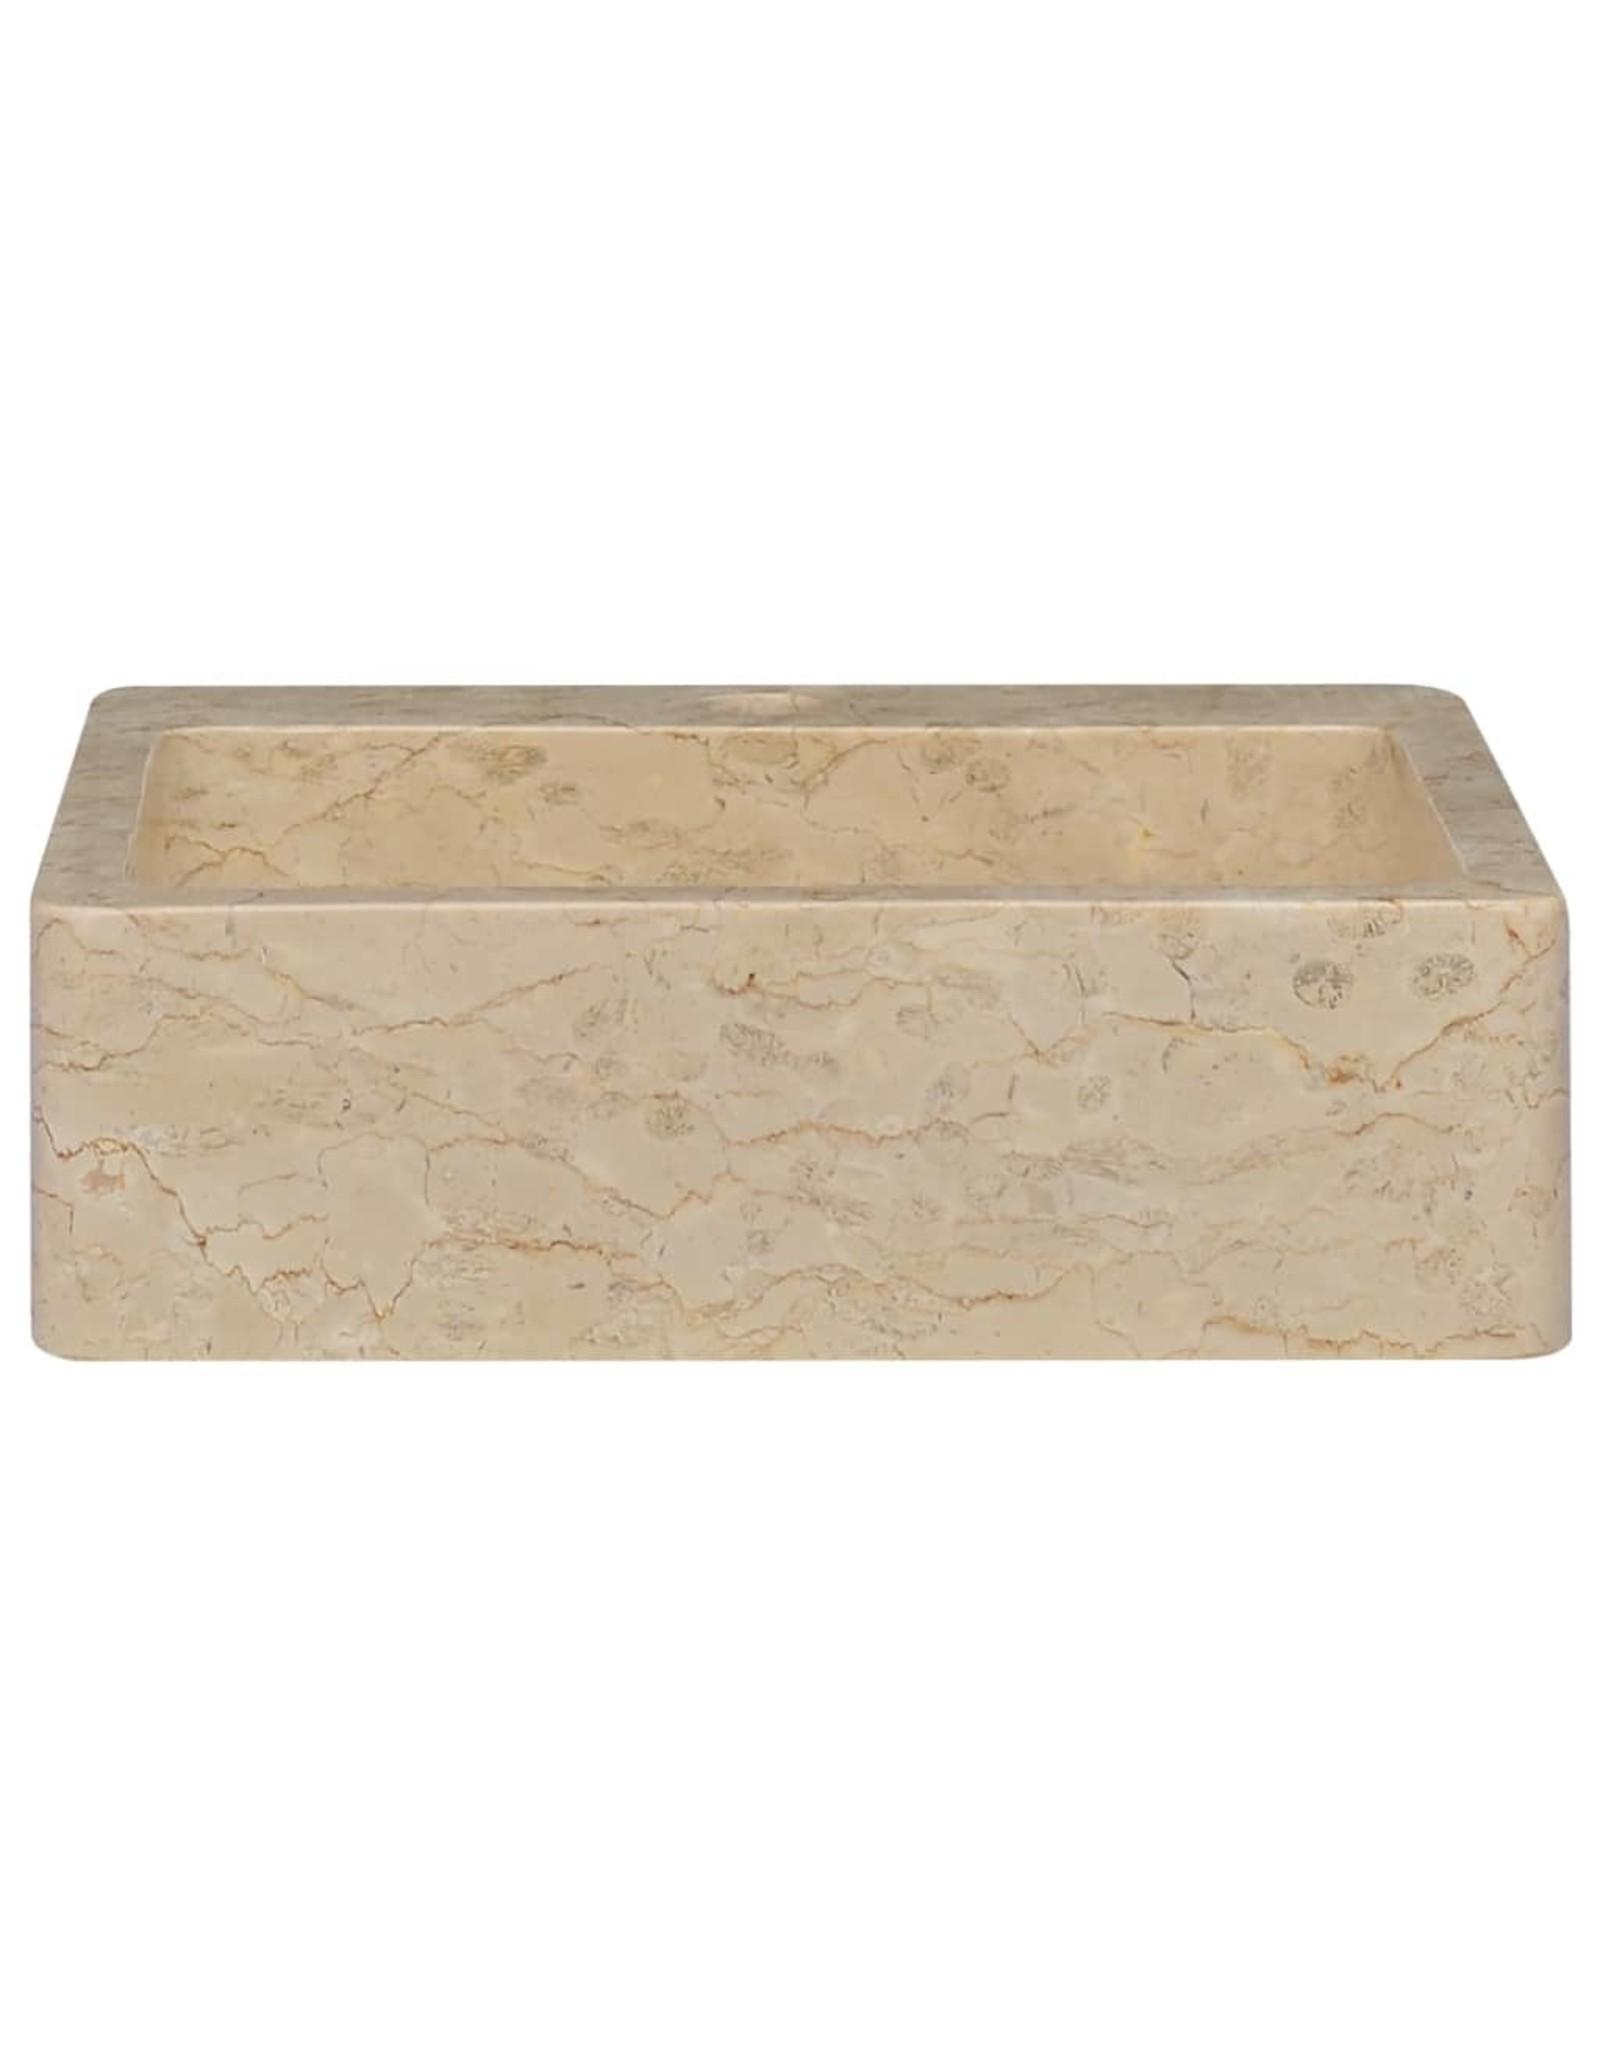 Gootsteen 40x40x12 cm marmer crèmekleurig